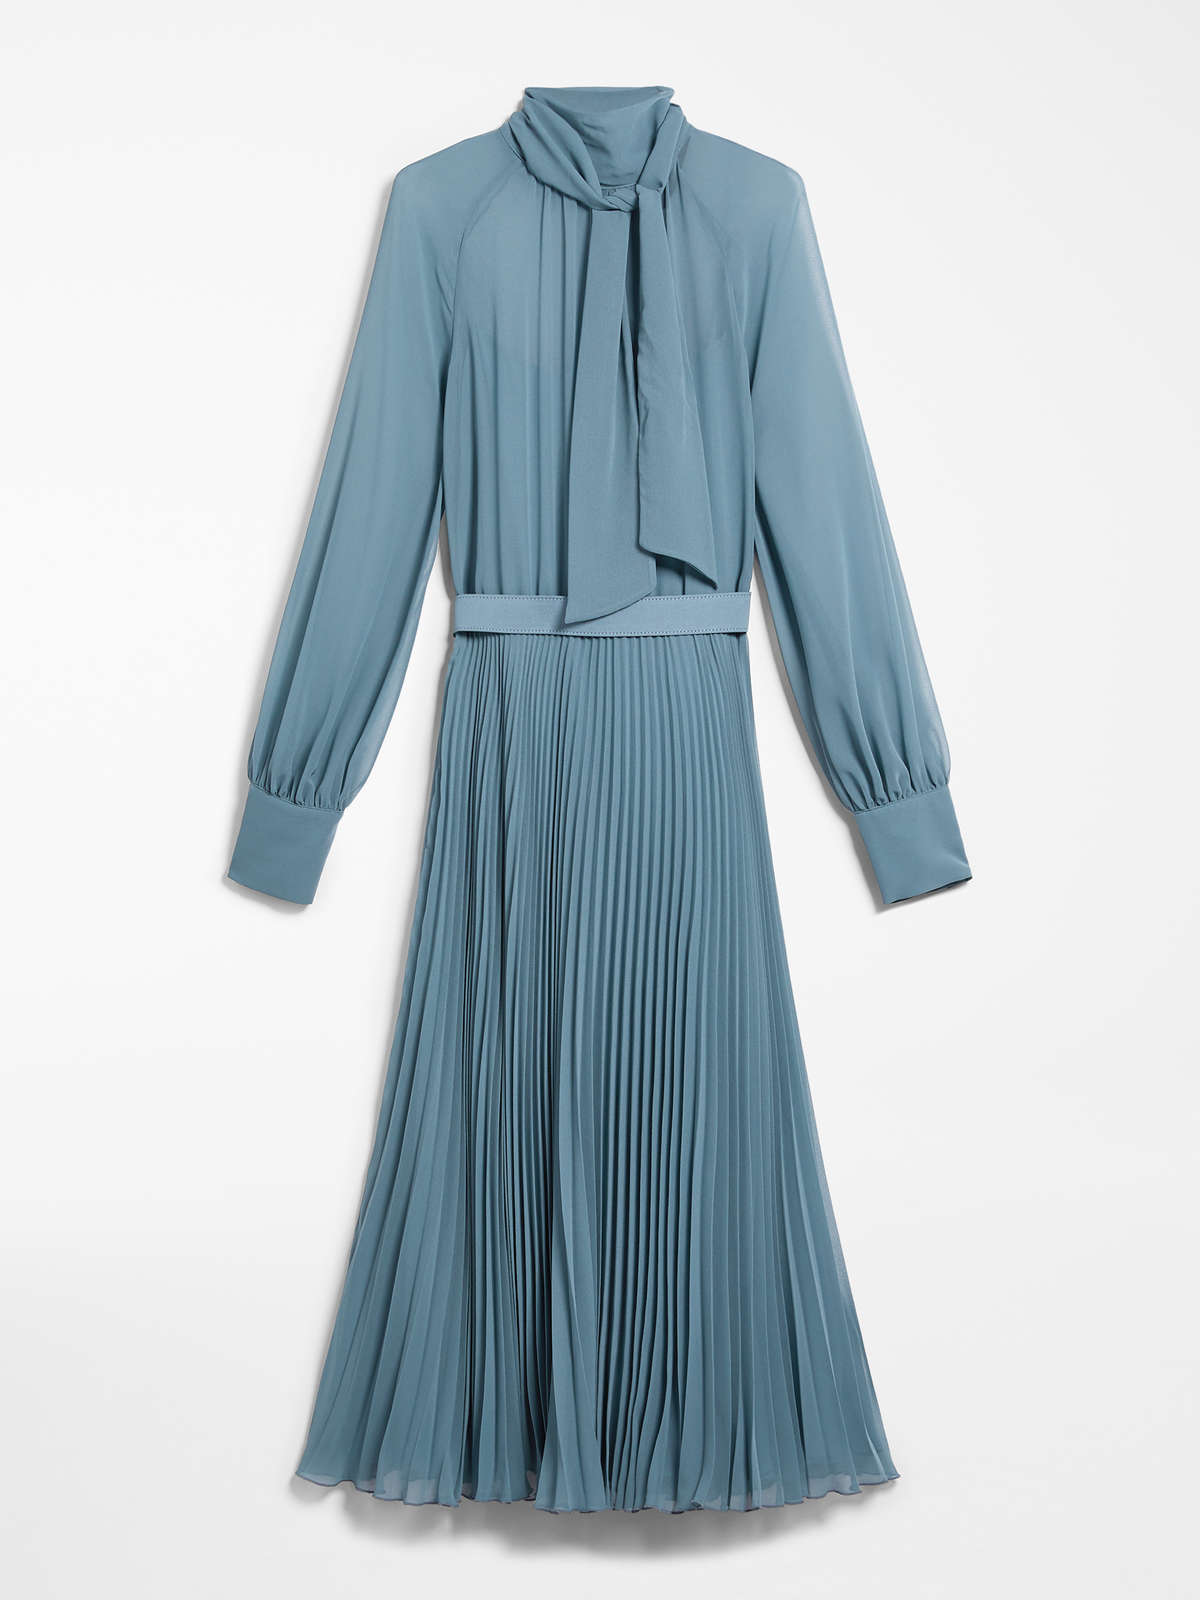 Georgette Sablé Dress by Max Mara